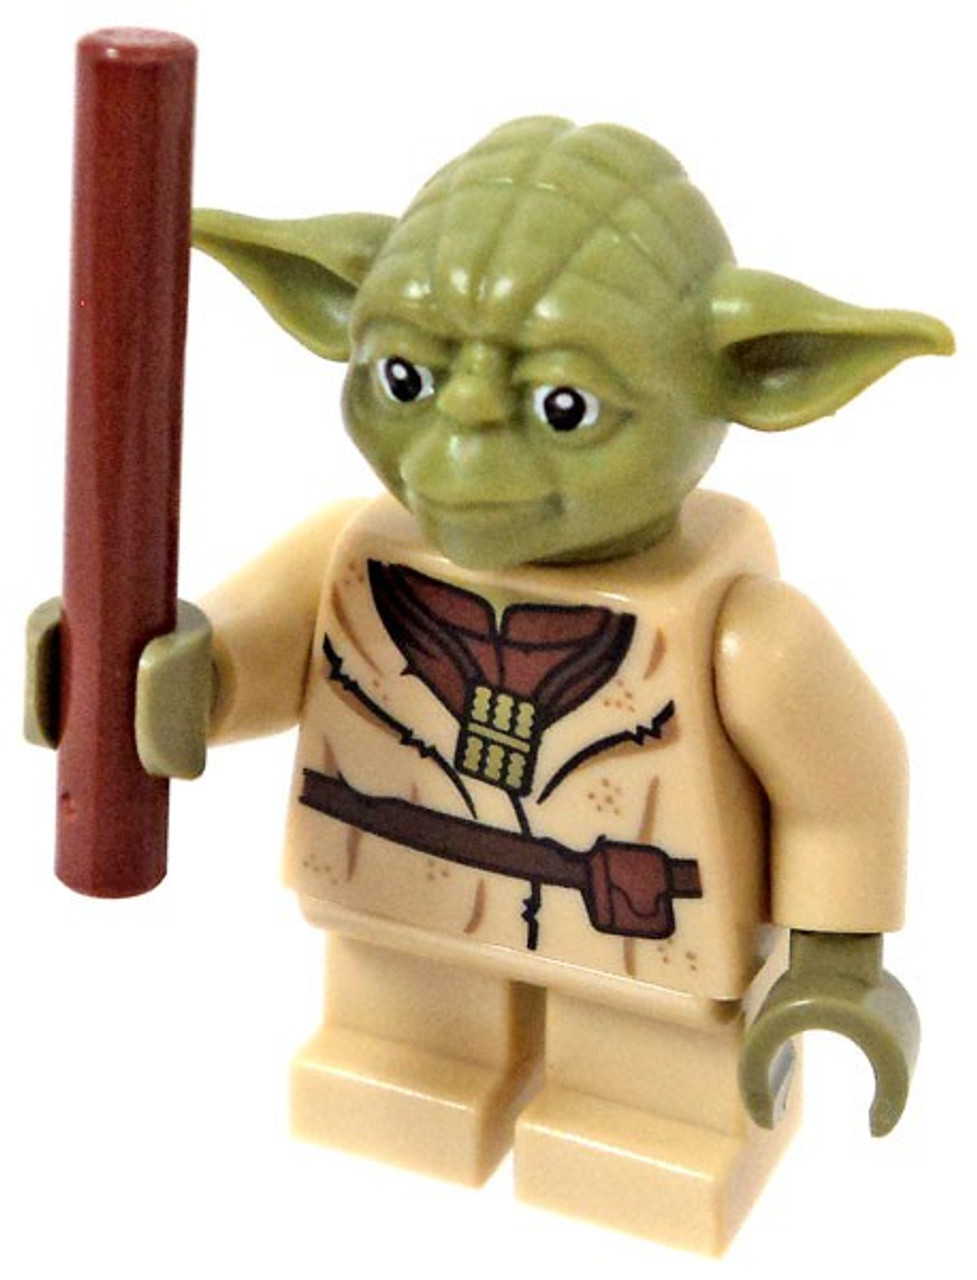 lego star wars yoda minifigure original trilogy variant loose - Lego Yoda